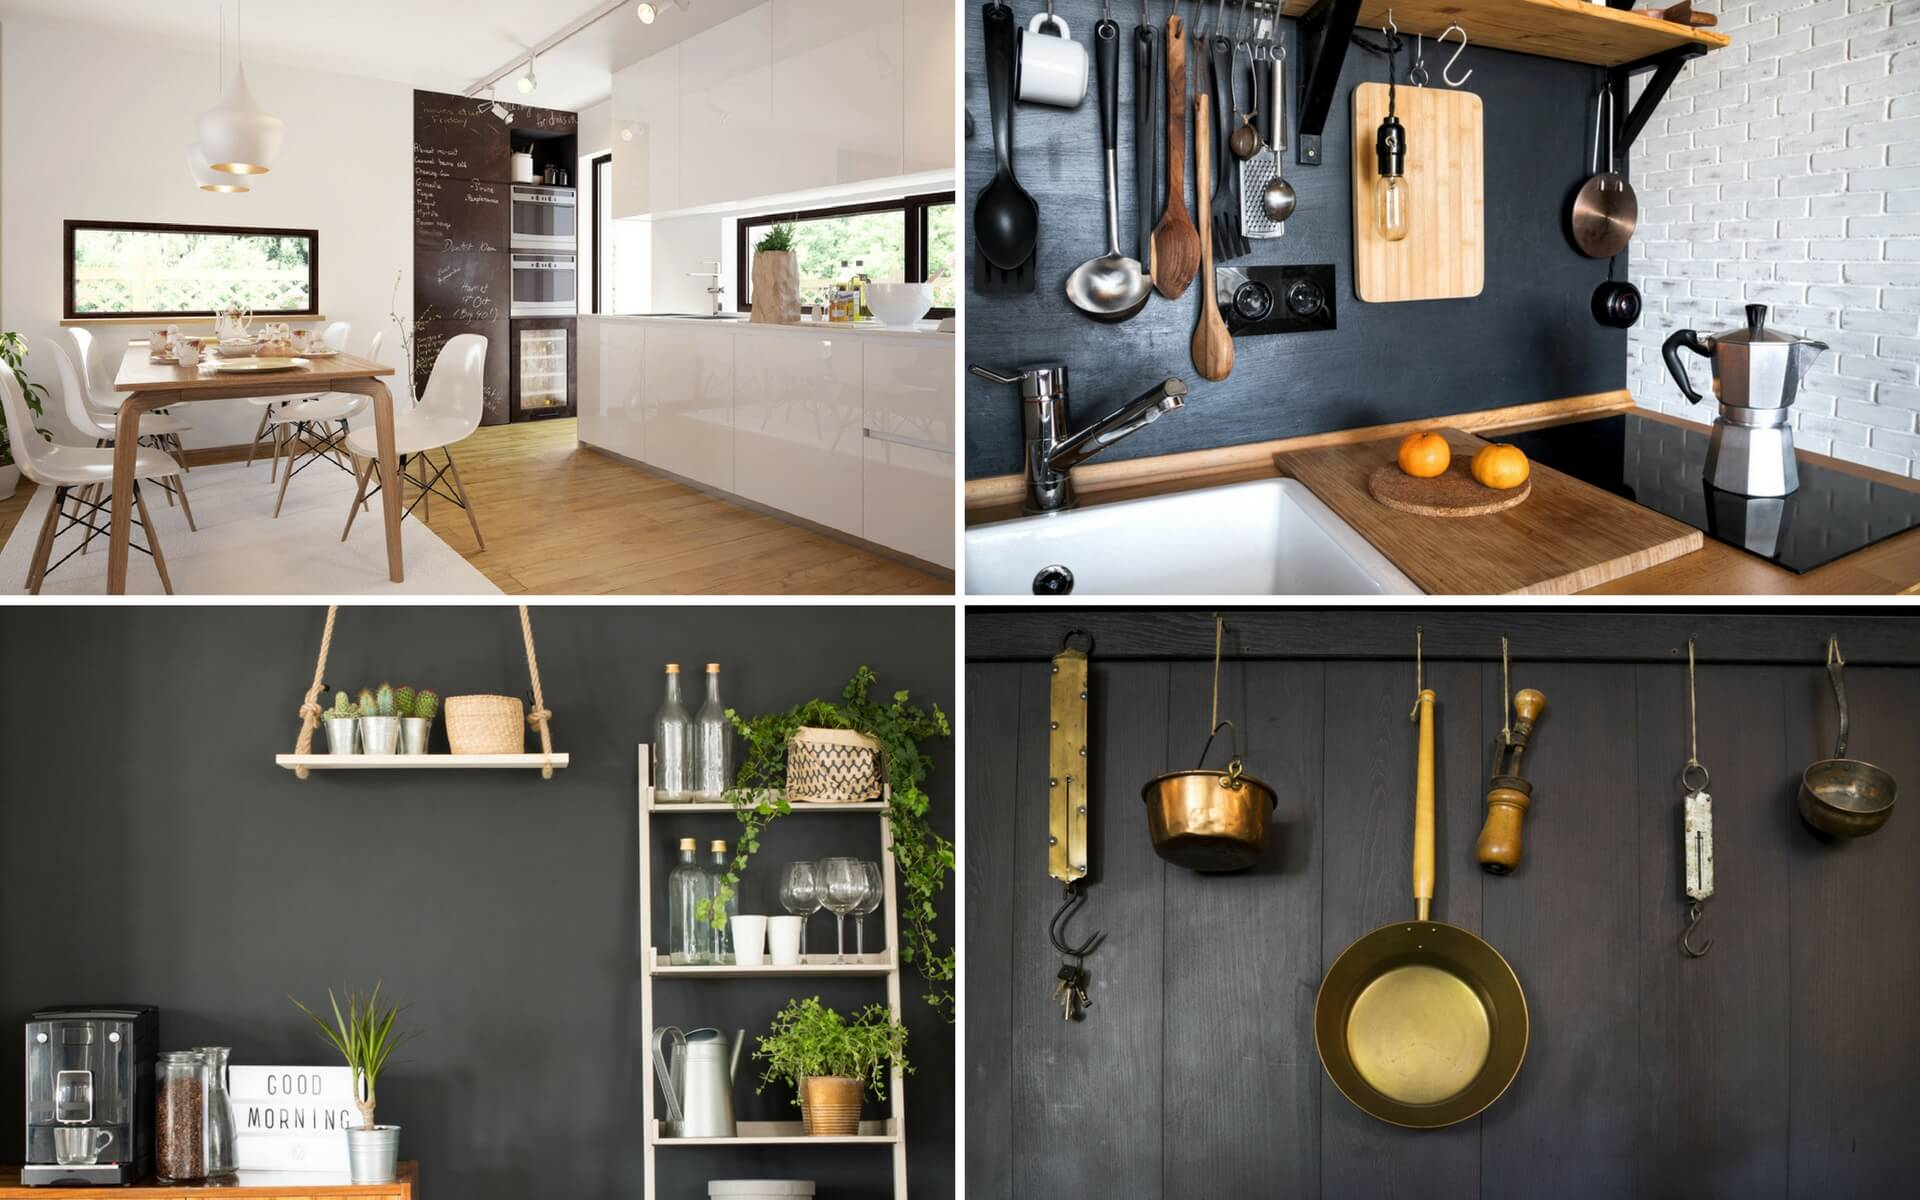 Decorare le pareti con vernice lavagna blog oknoplast - Lavagna da cucina ...